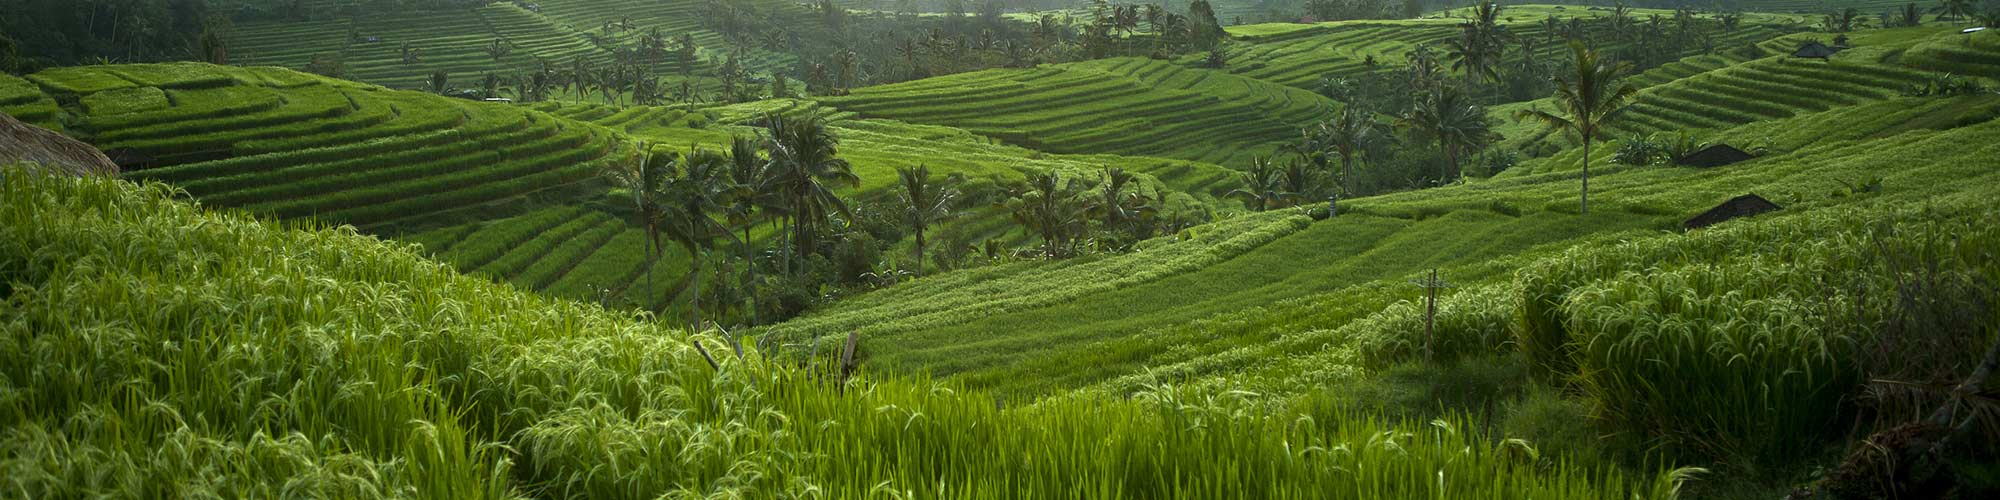 Tabanan, Indonesia - El Pais Viajes